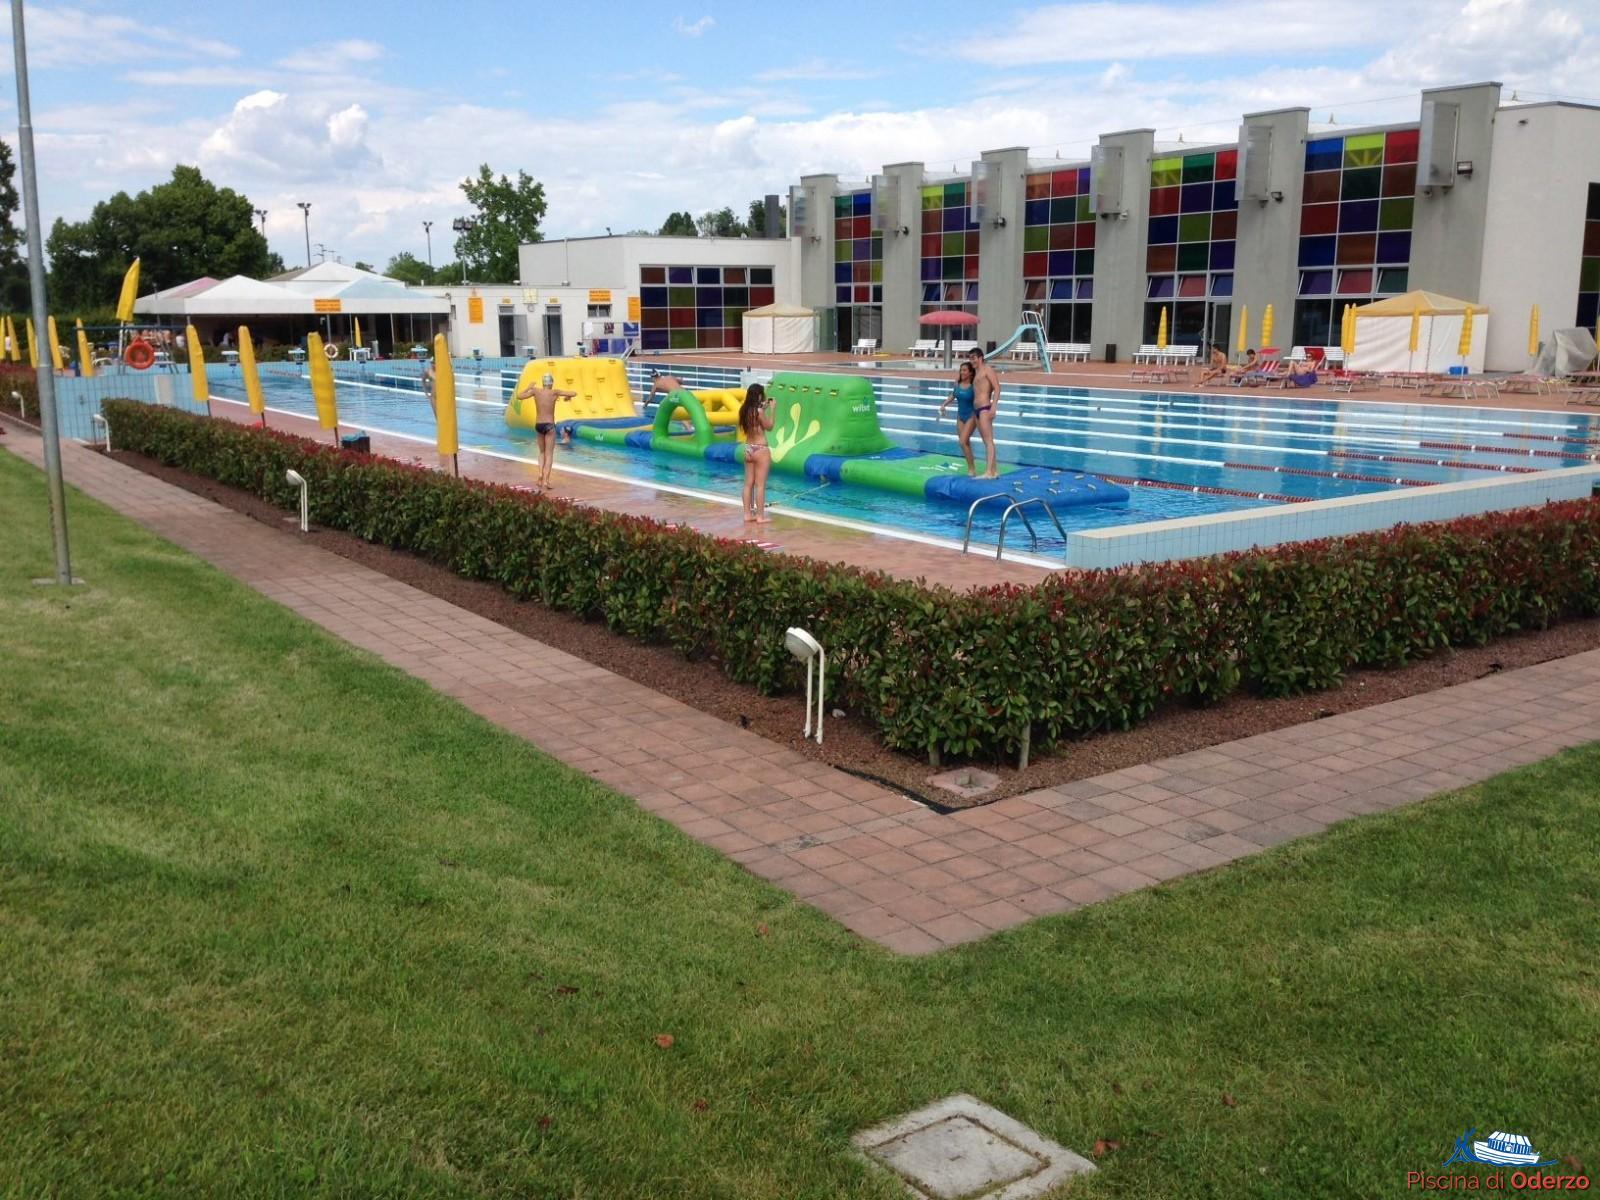 Vasca Da 25 Metri Tempi : Vasche ed impianto sportivo piscina di oderzo